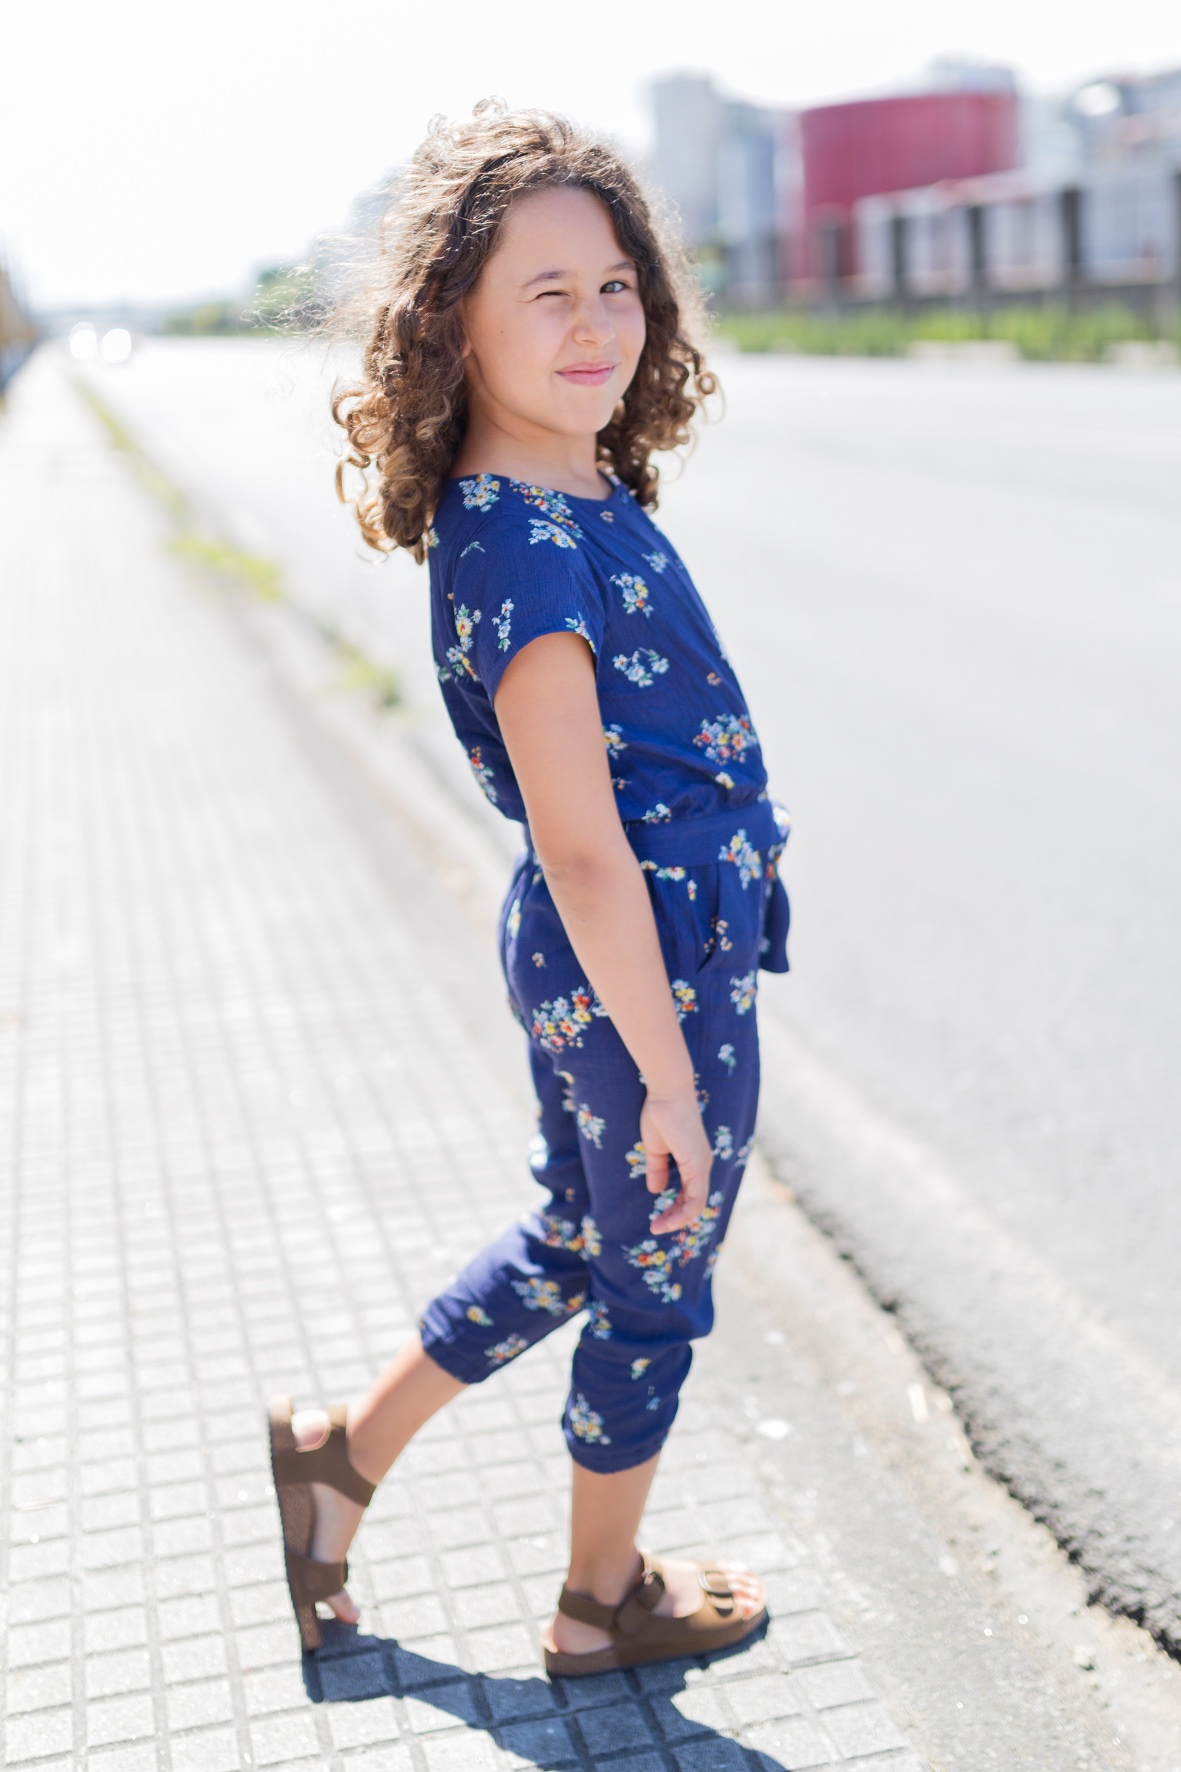 blog-moda niños-zippy sandals-miniblogger-descalzaporelparque -coruña -jimena - jimena look- jumpsuit -kids -miniblogger - moda infantil -mono -niños- Soft -soft de ZARA KIDS - streestyle- style -zara-zara kids